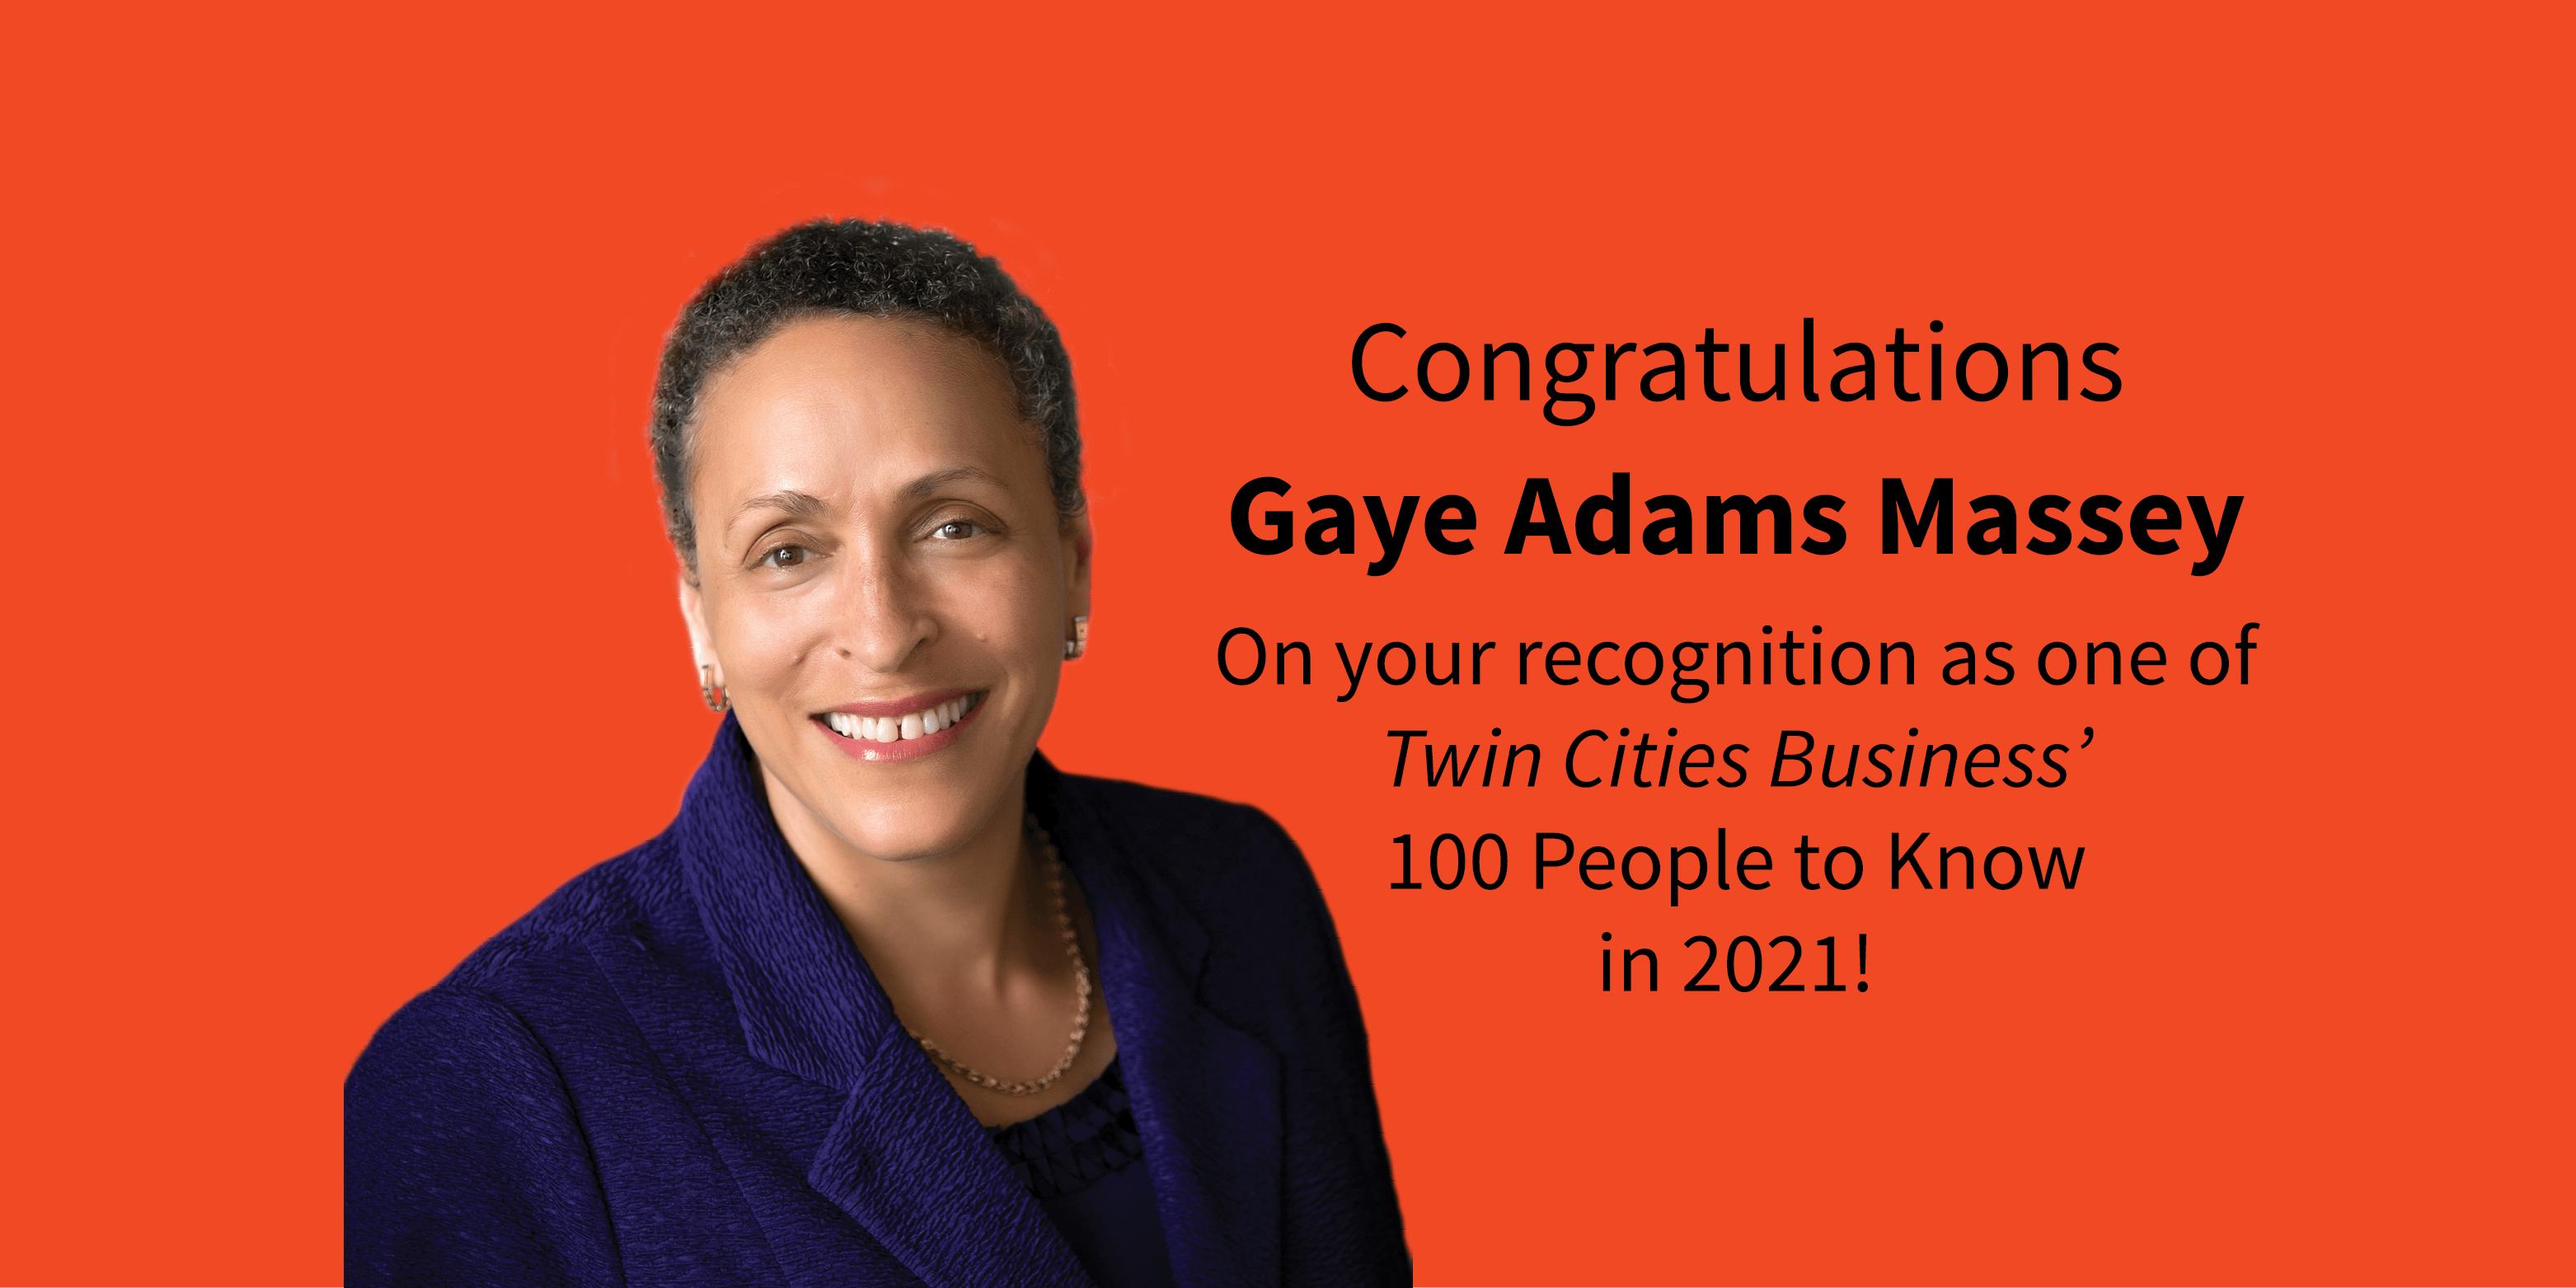 Gaye Adams Massey on orange background with congratulatory message beside her.